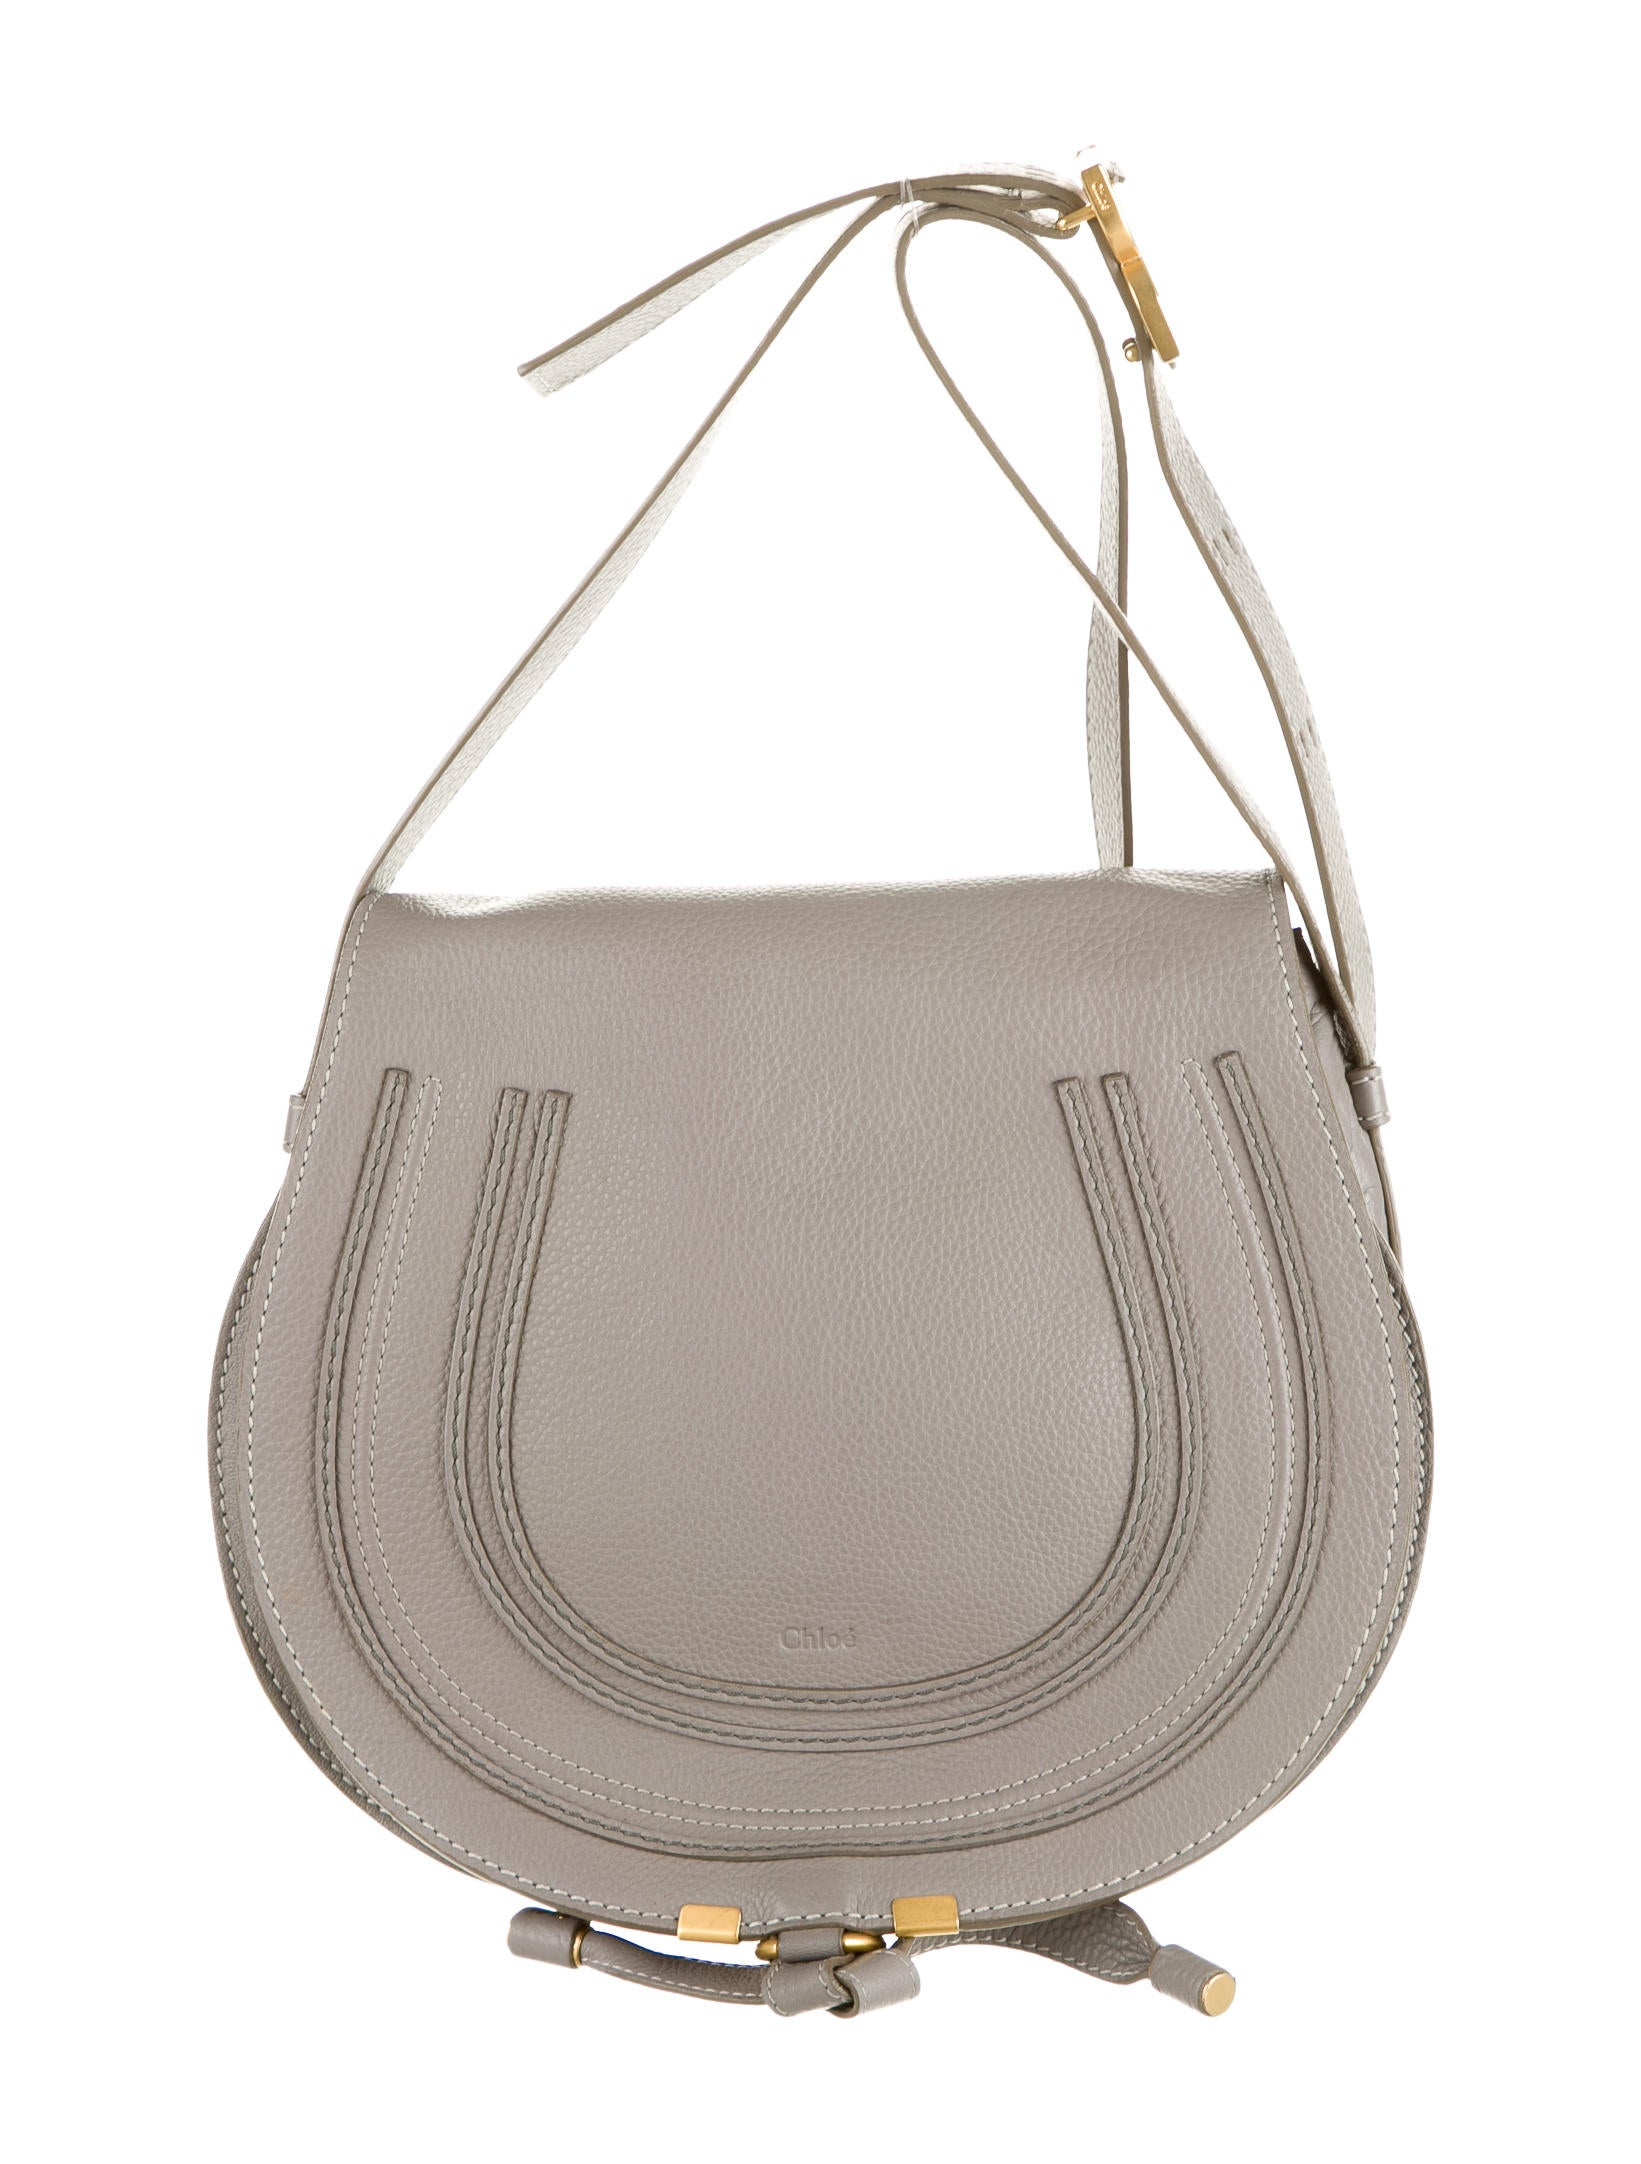 Chlo¨¦ Marcie Mini Crossbody Bag - Handbags - CHL24814 | The RealReal